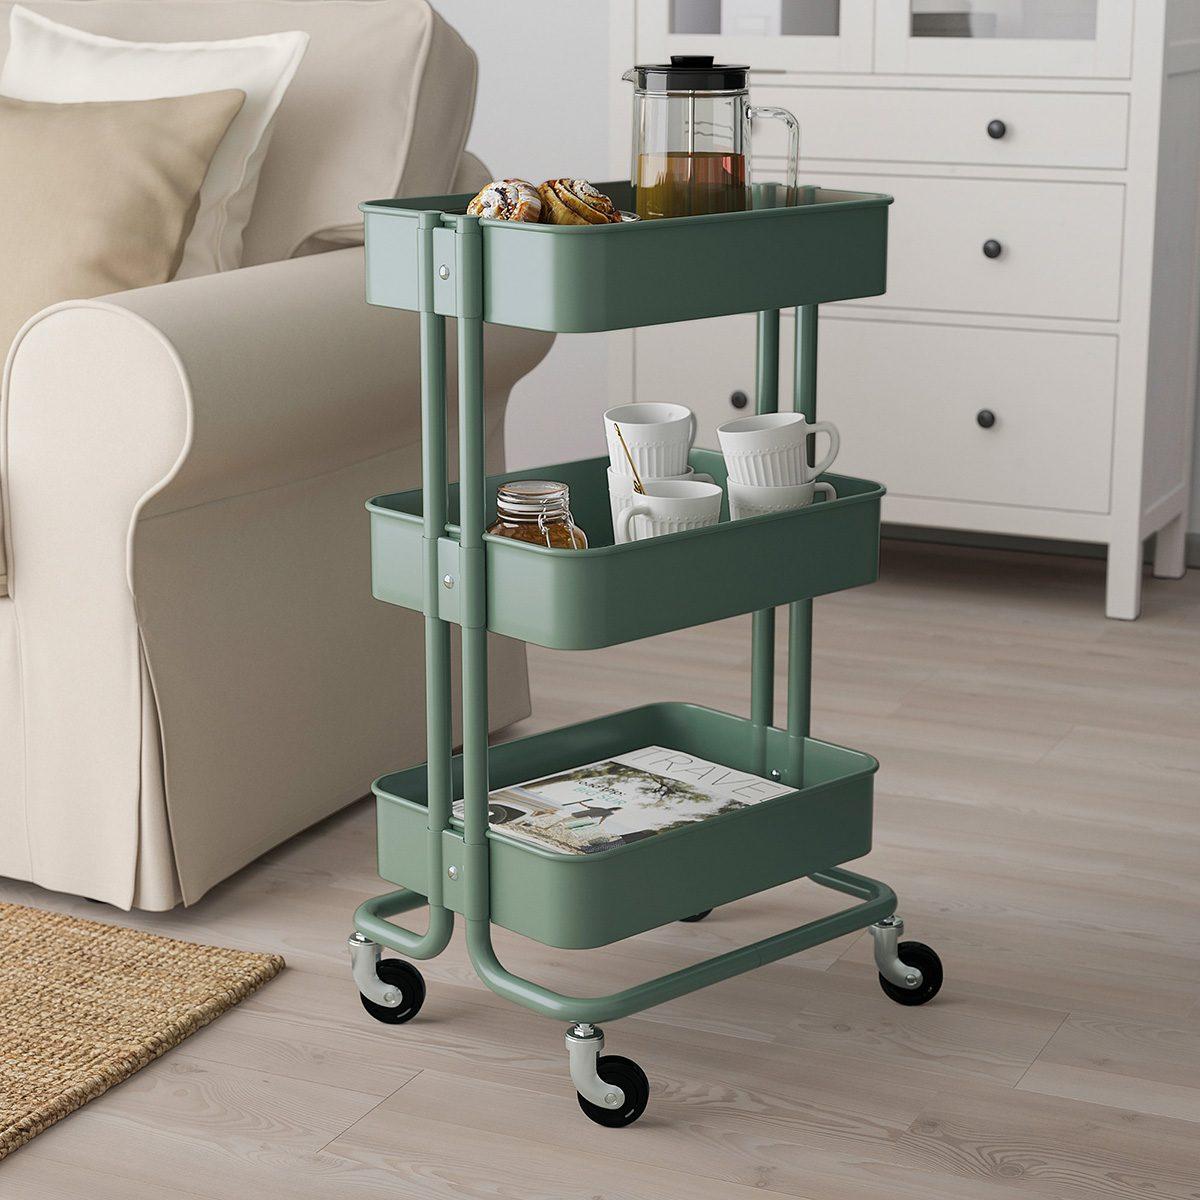 RSKOG Utility cart, gray-green